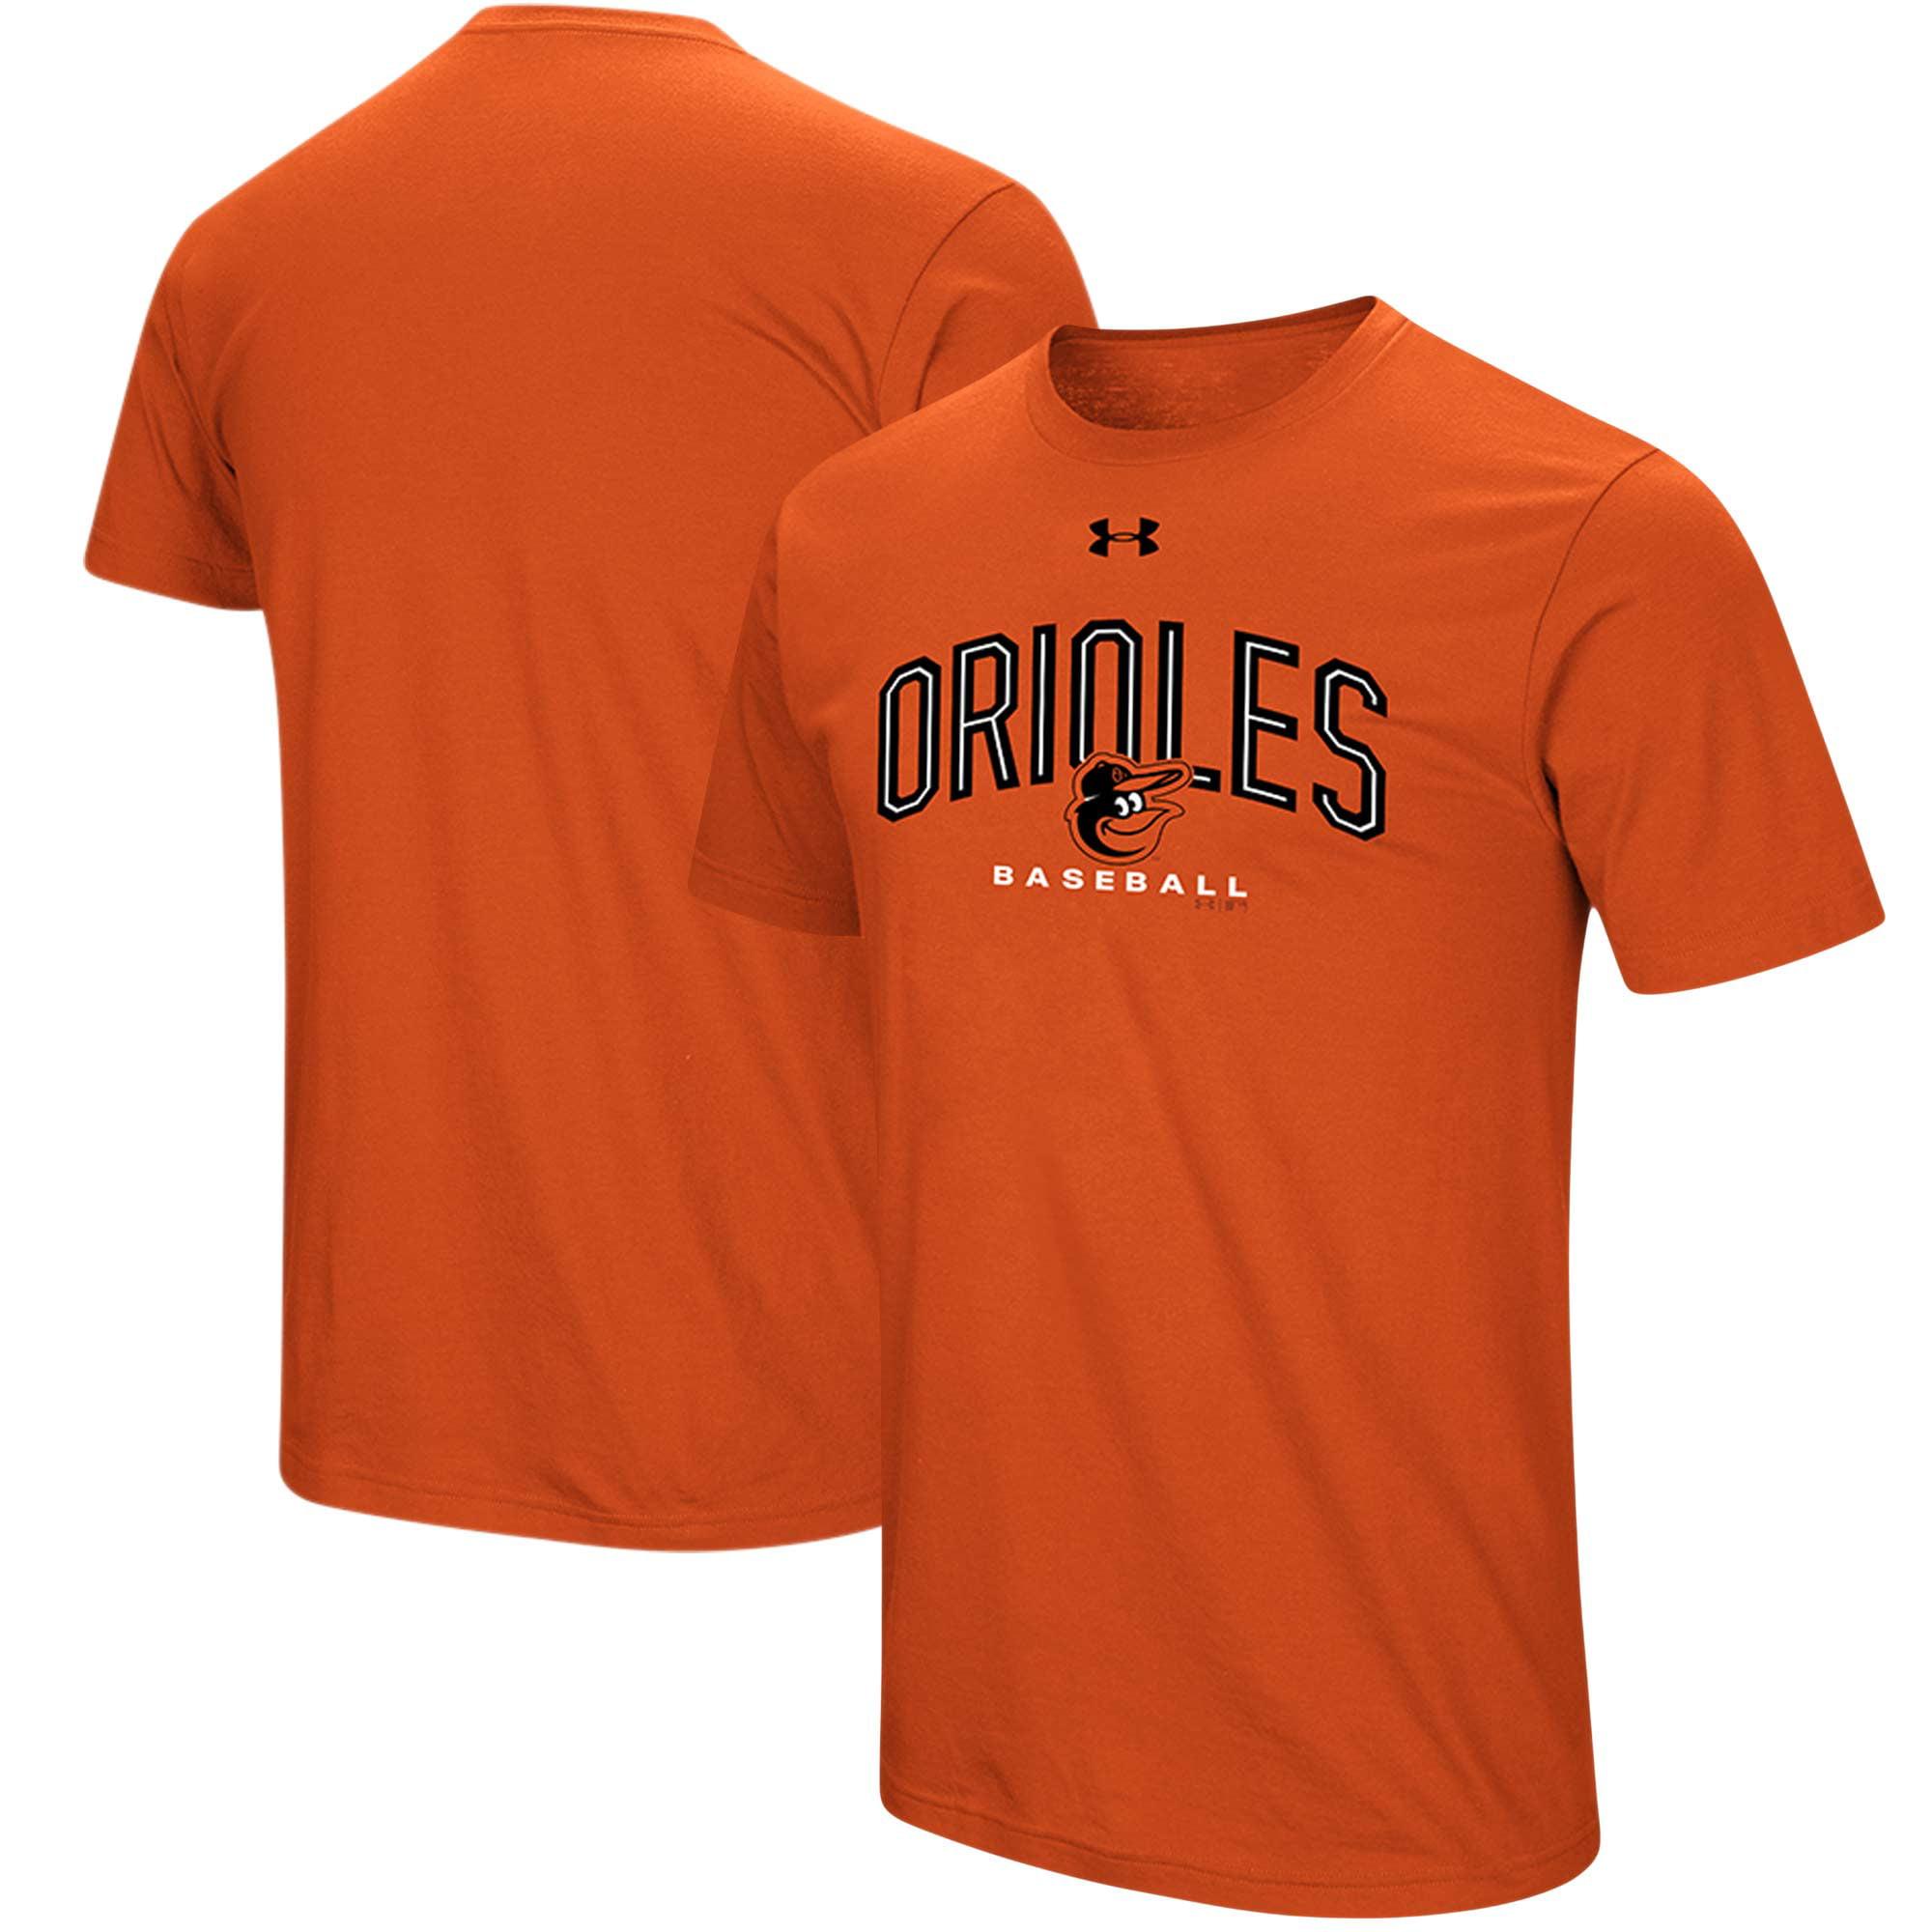 Baltimore Orioles Under Armour Performance Arch T-Shirt - Orange